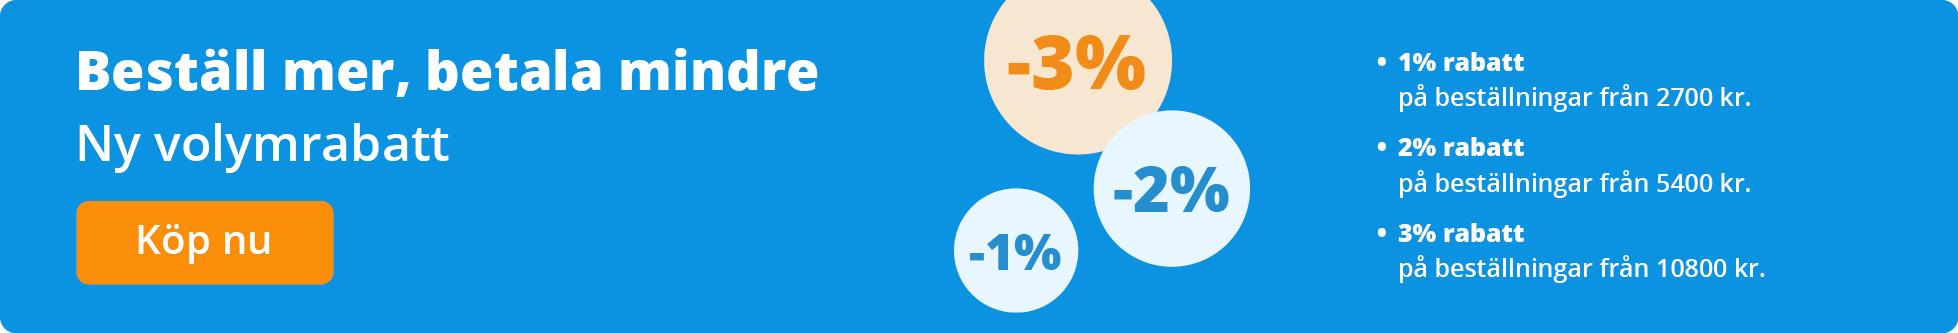 -1% -2% -3%